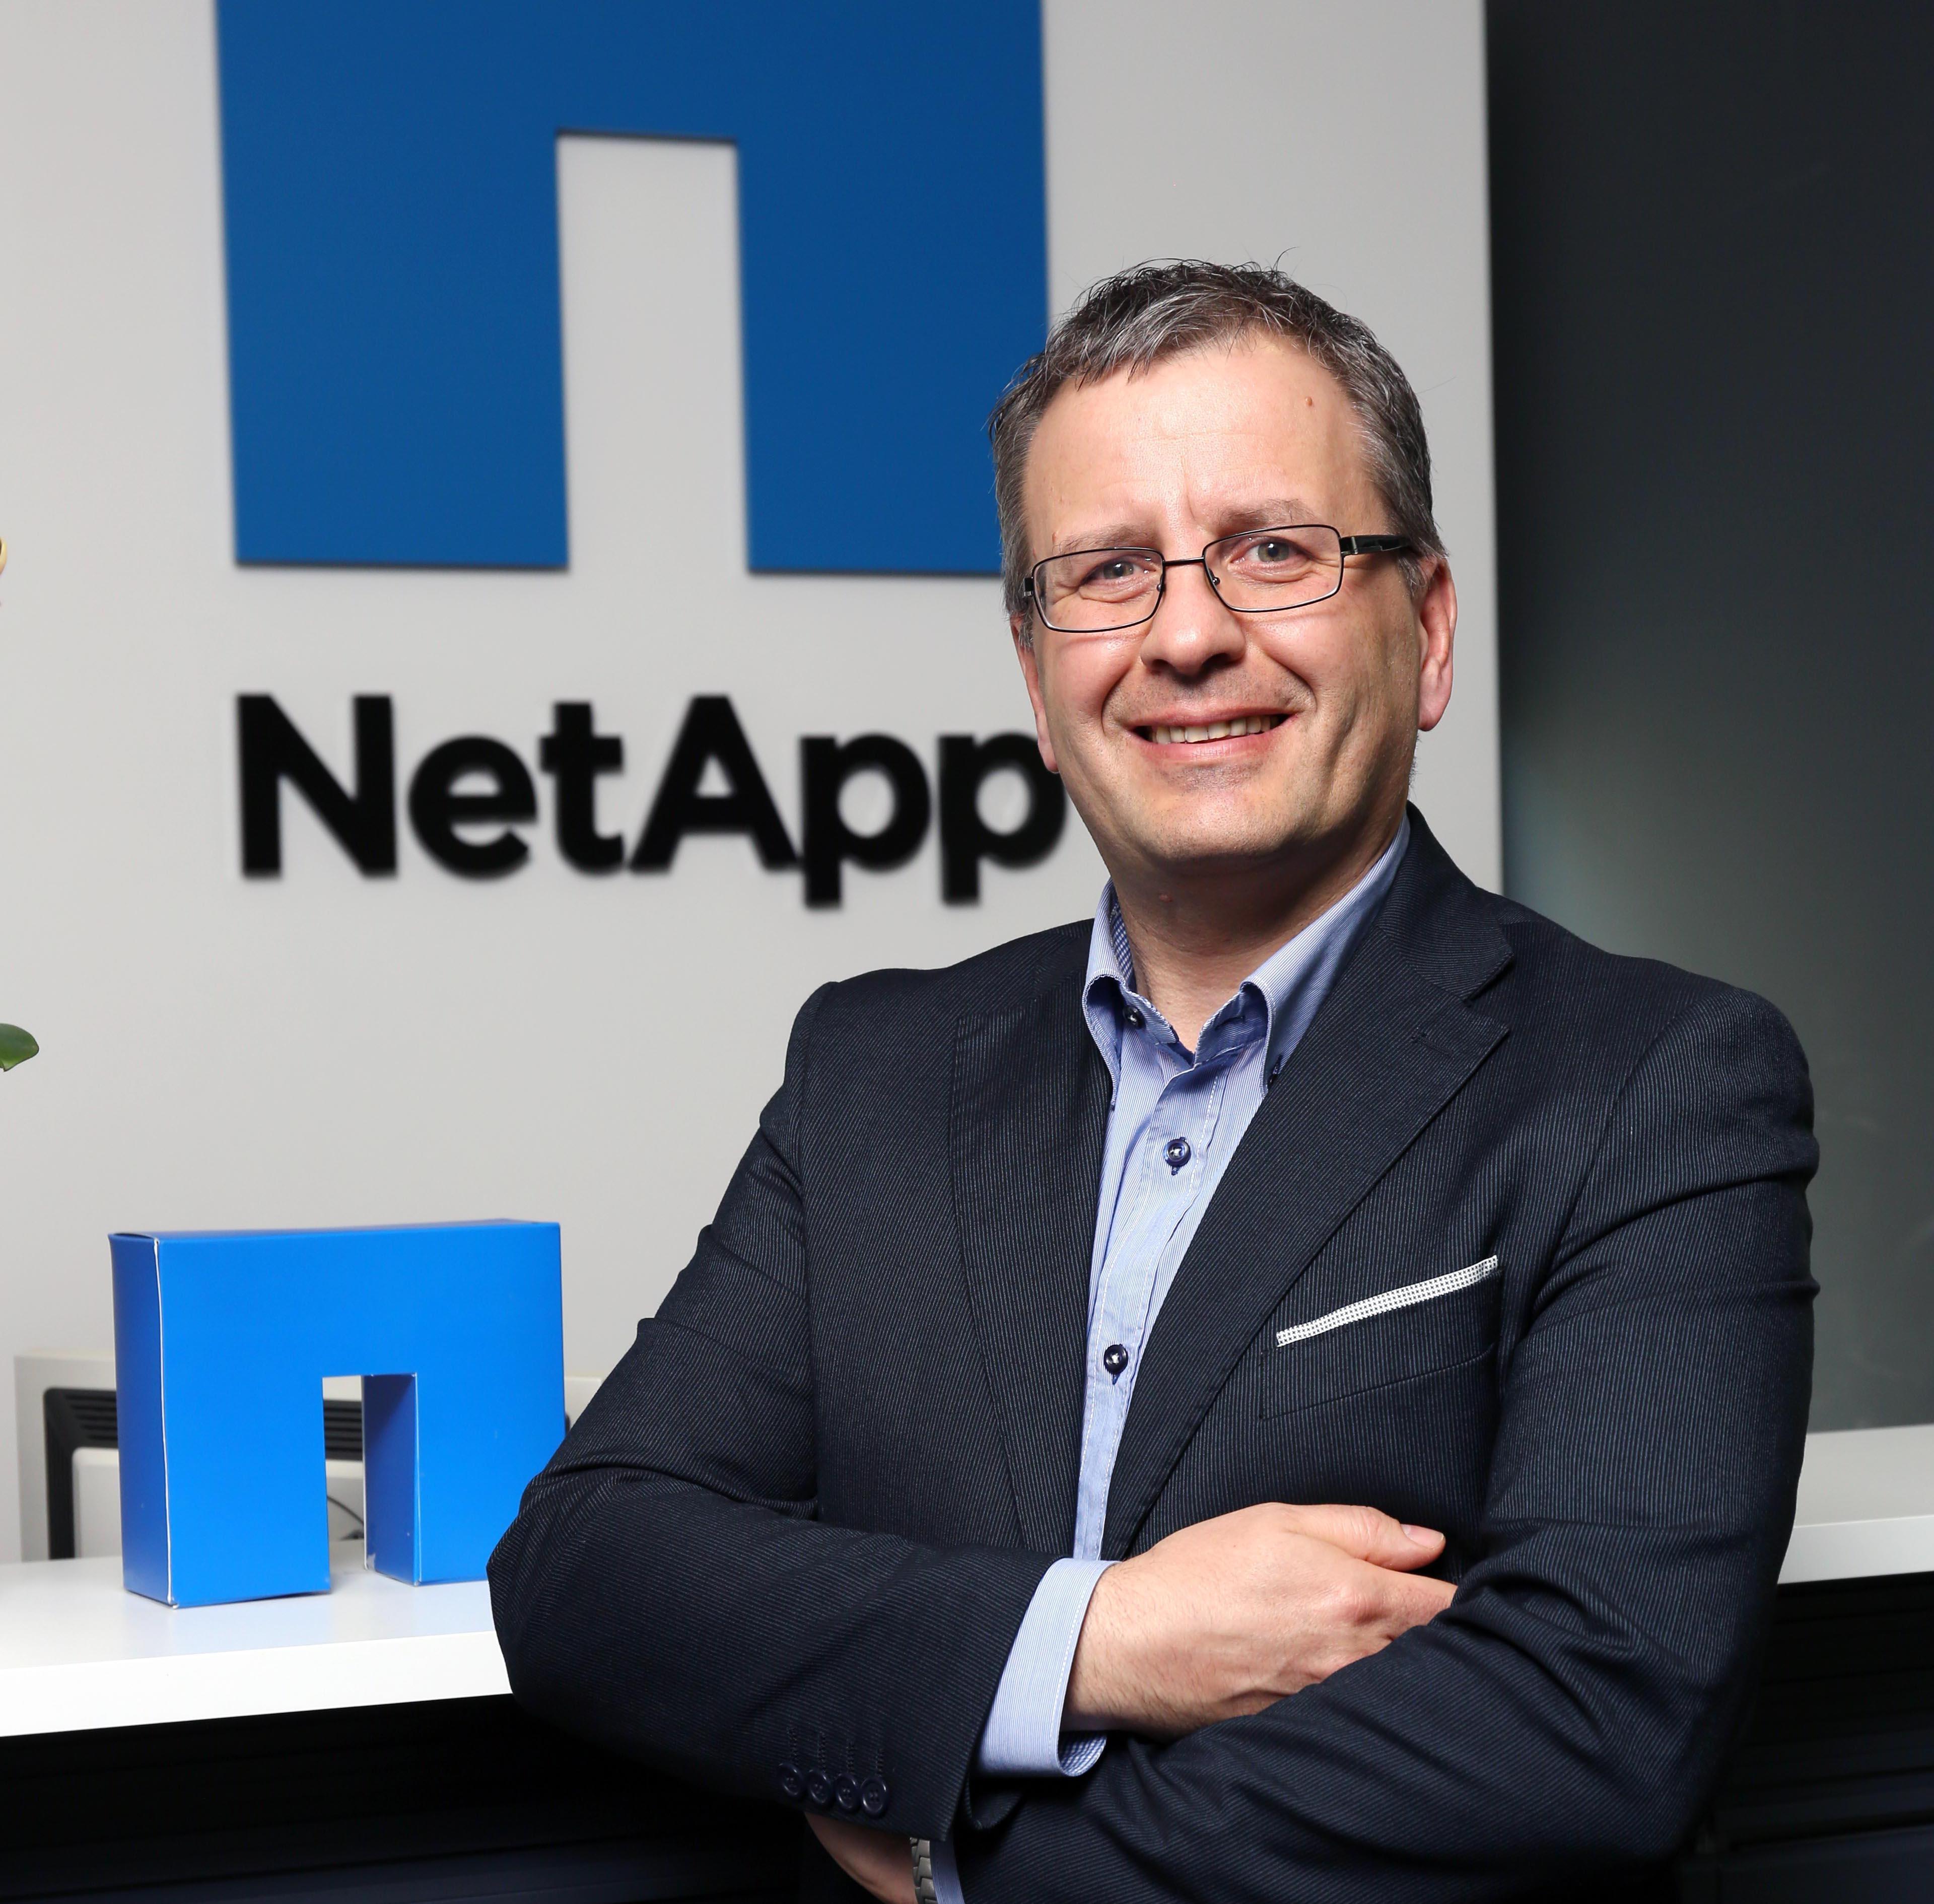 Roberto Patano, senior manager Systems Engineering di NetApp Italia